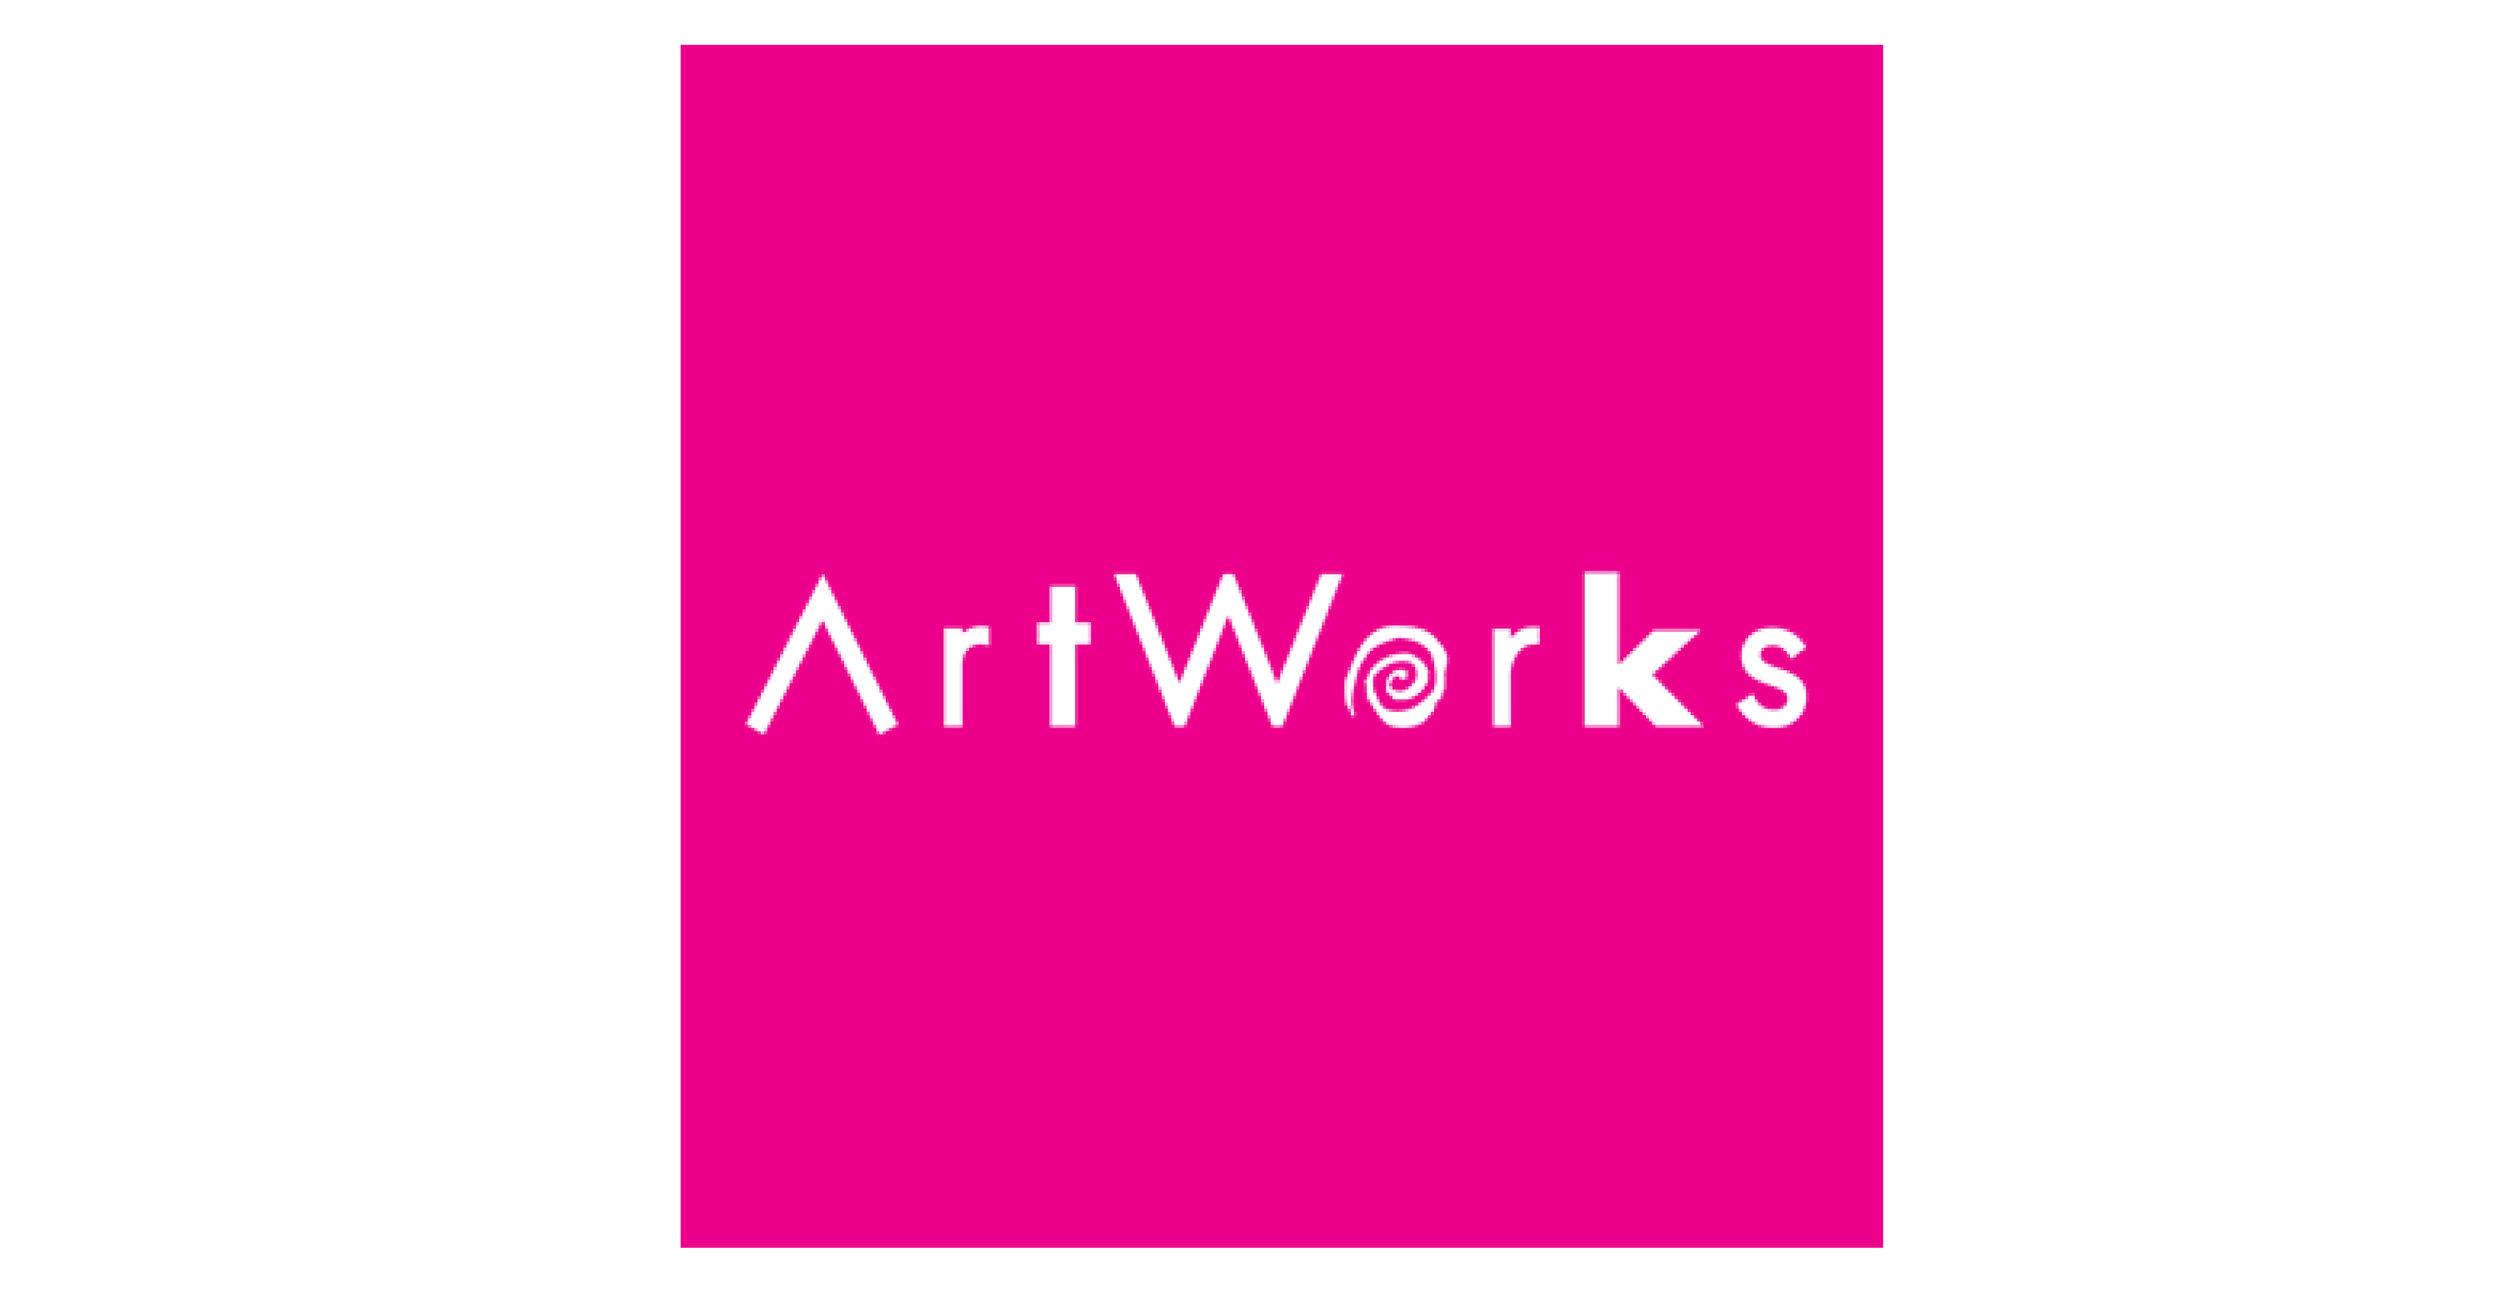 18-Squarespace-Work_Experience-Logos-ArtWorks.jpg